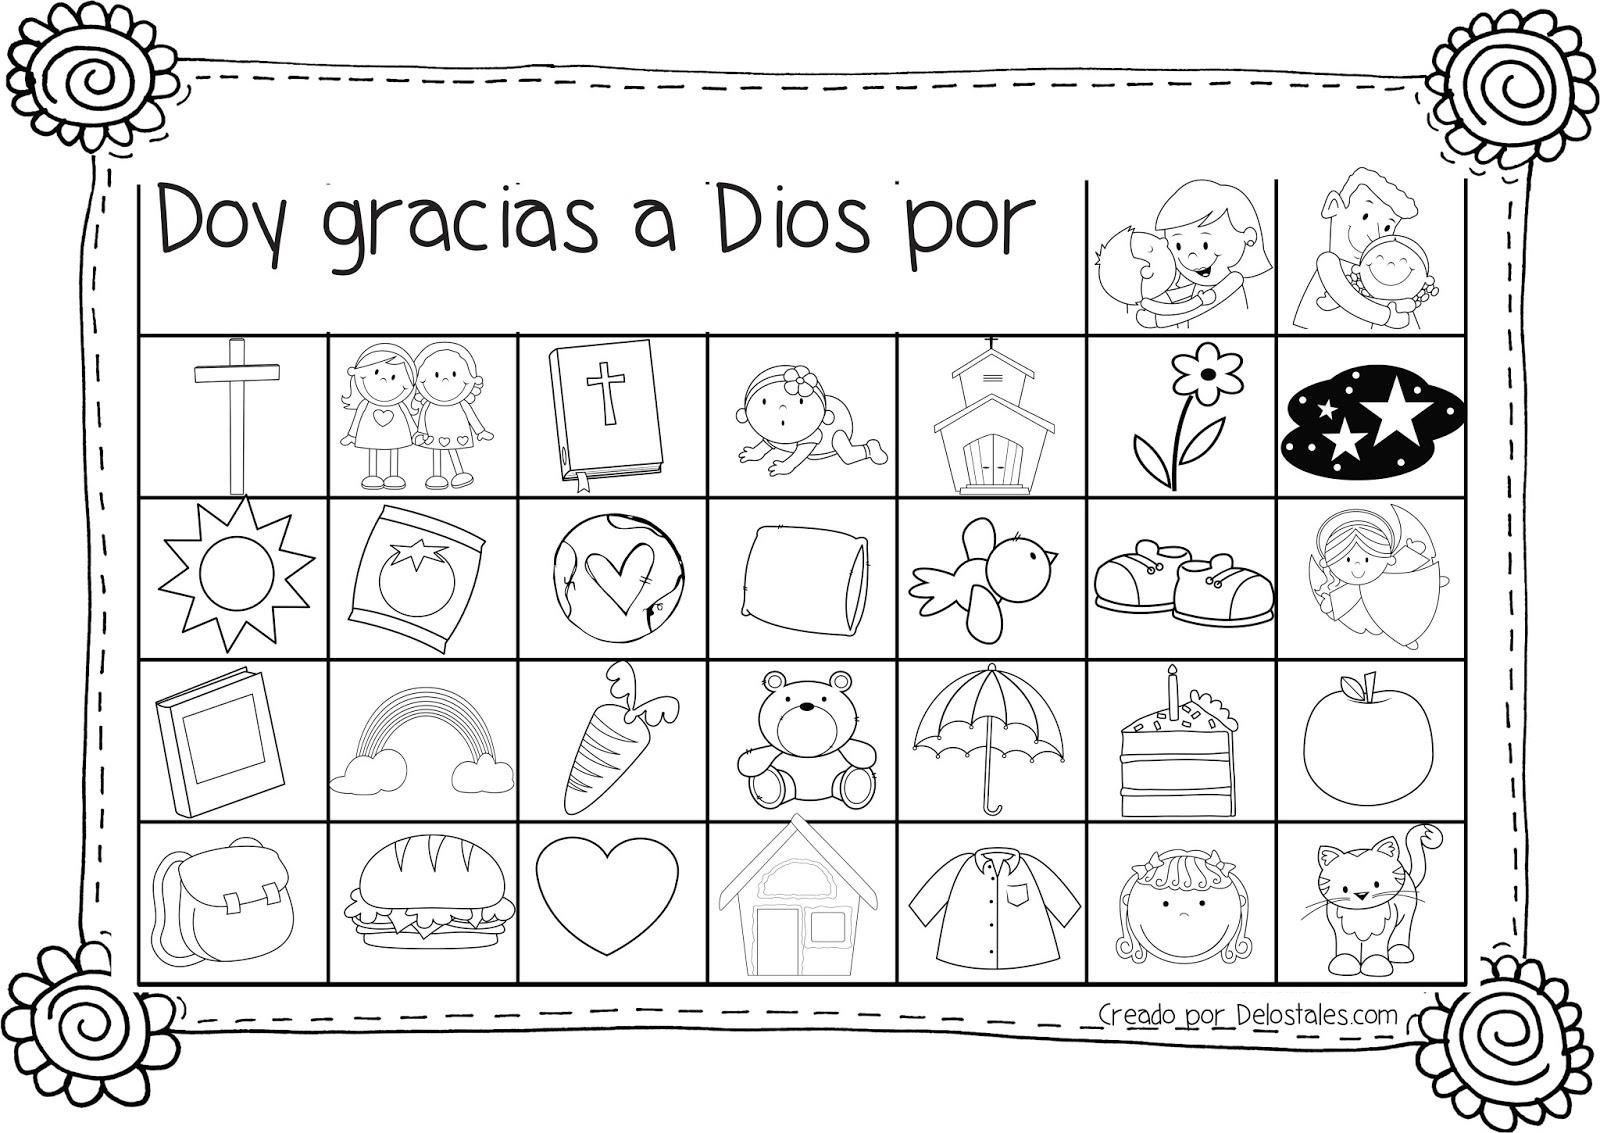 Dorable Ser Agradecido Para Colorear Ideas - Dibujos Para Colorear ...